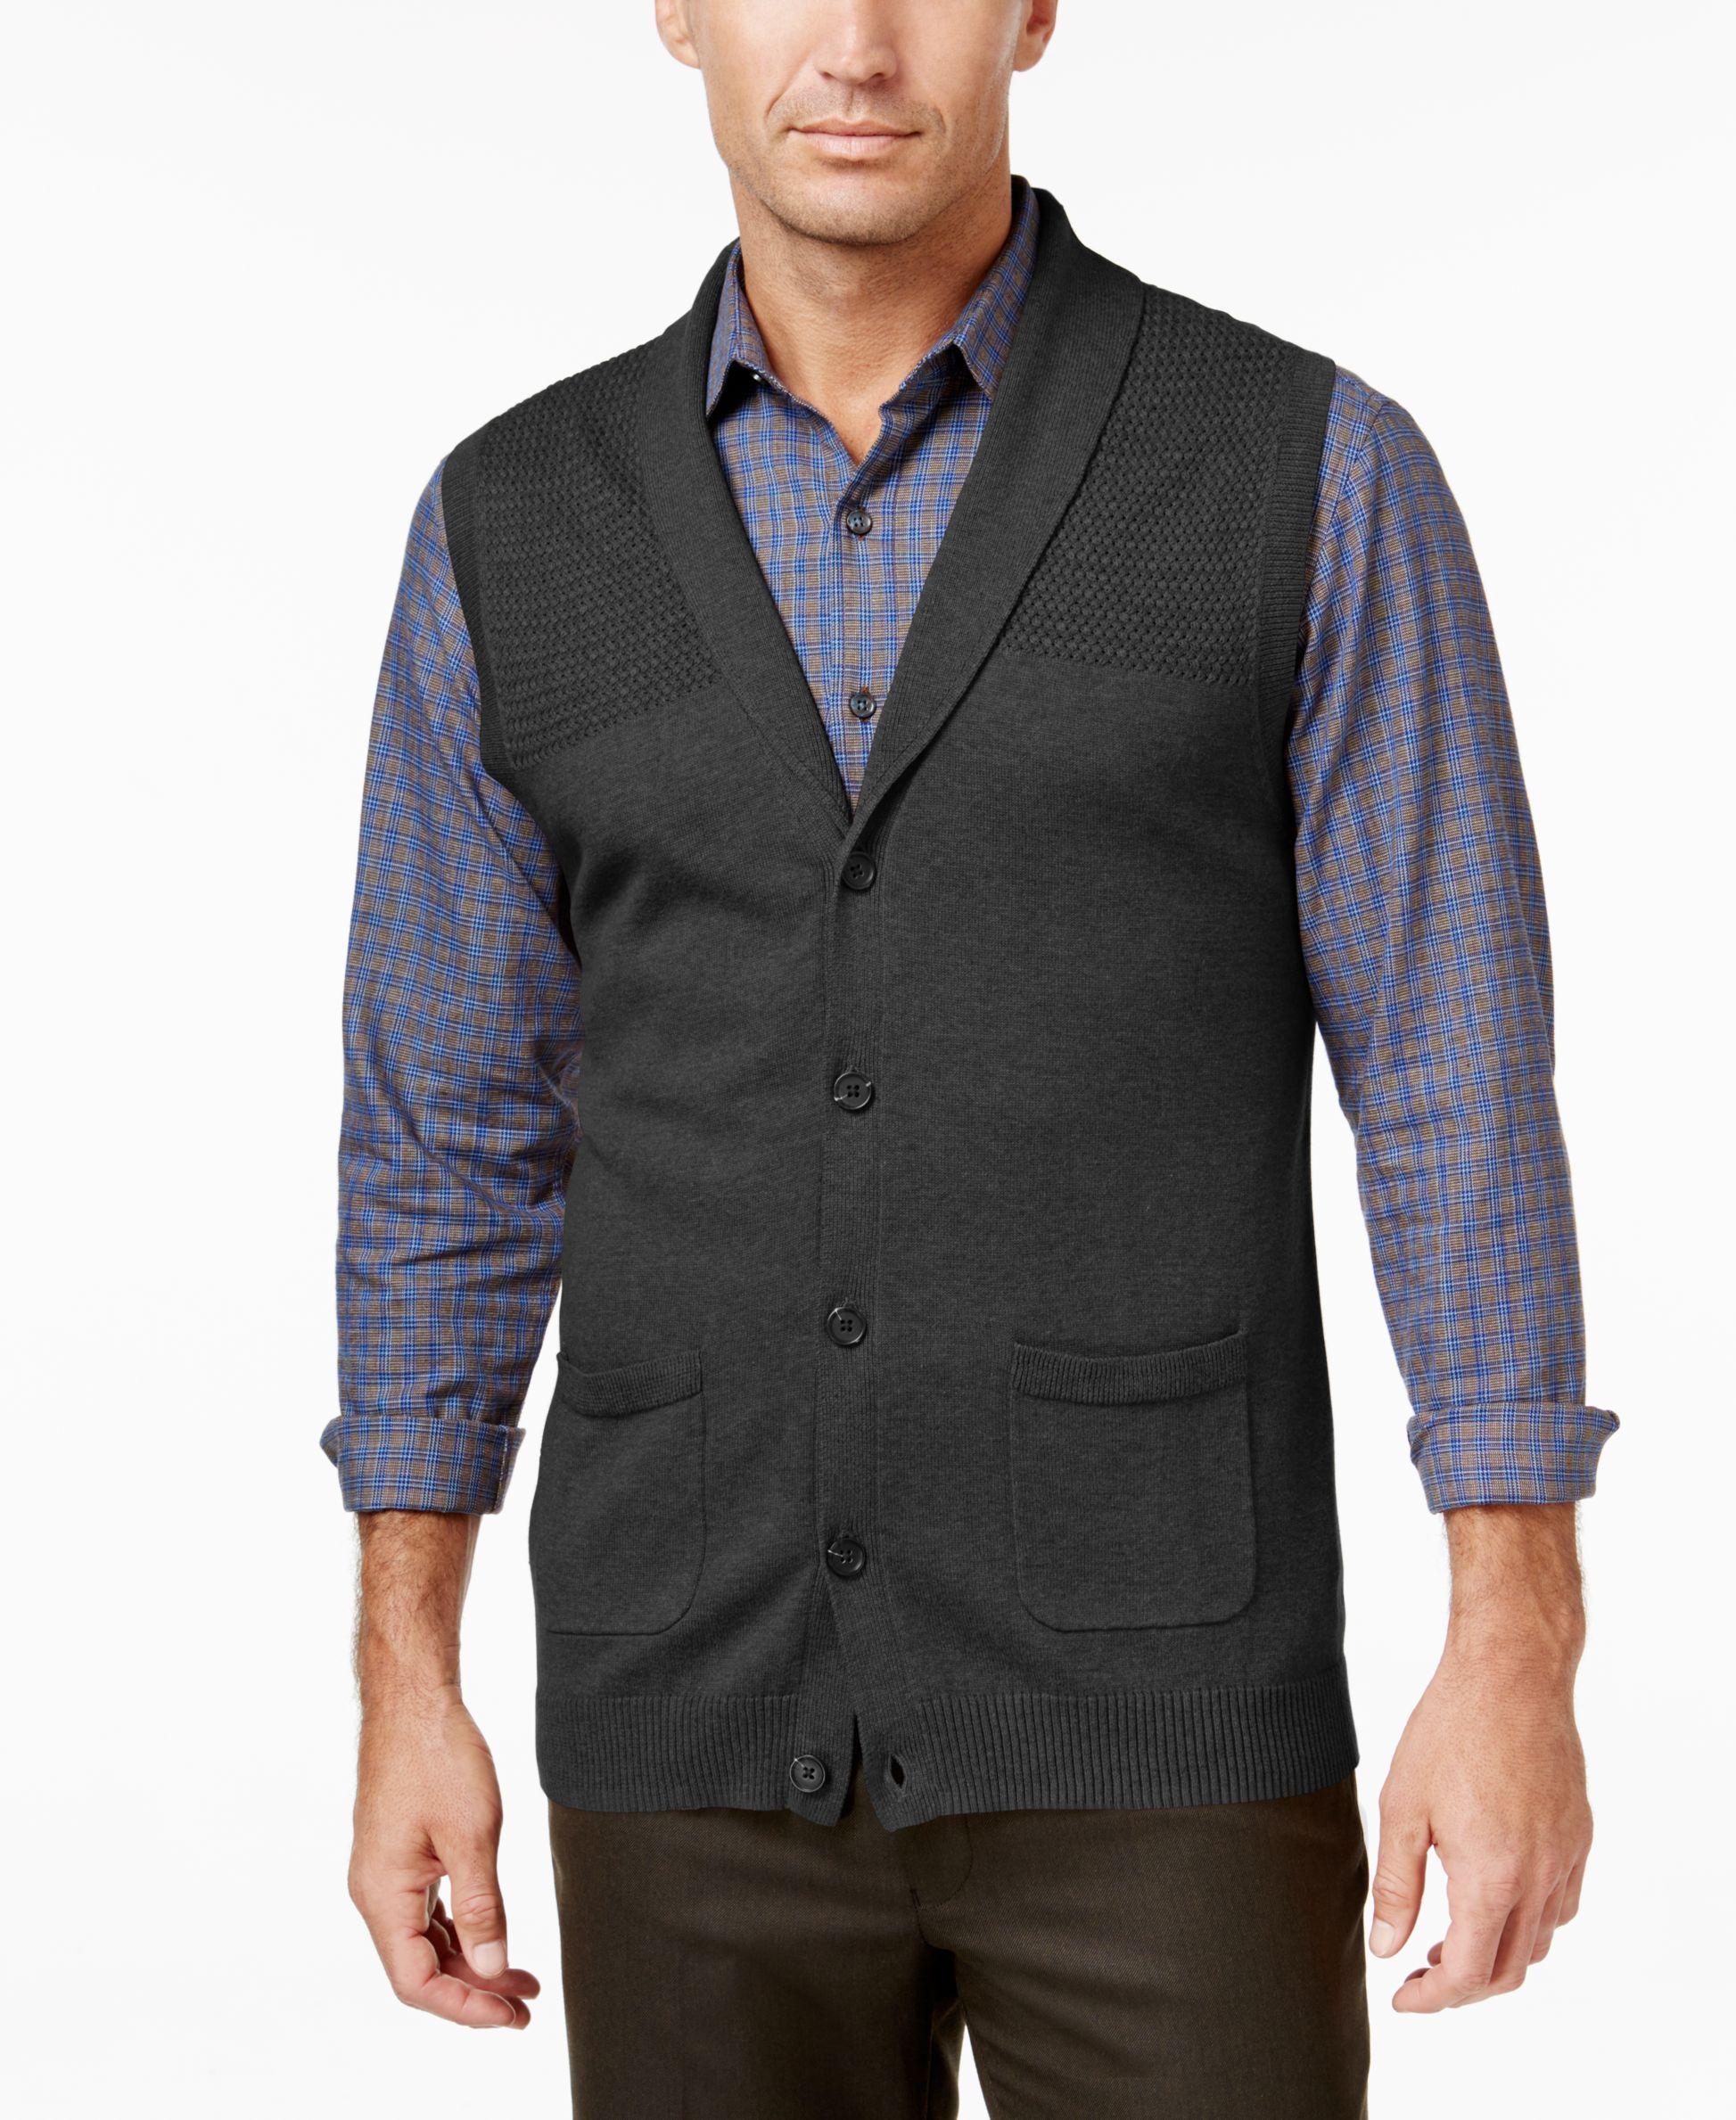 Tasso Elba Men's Shawl-Collar Vest, Only at Macy's | Cardigans For ...